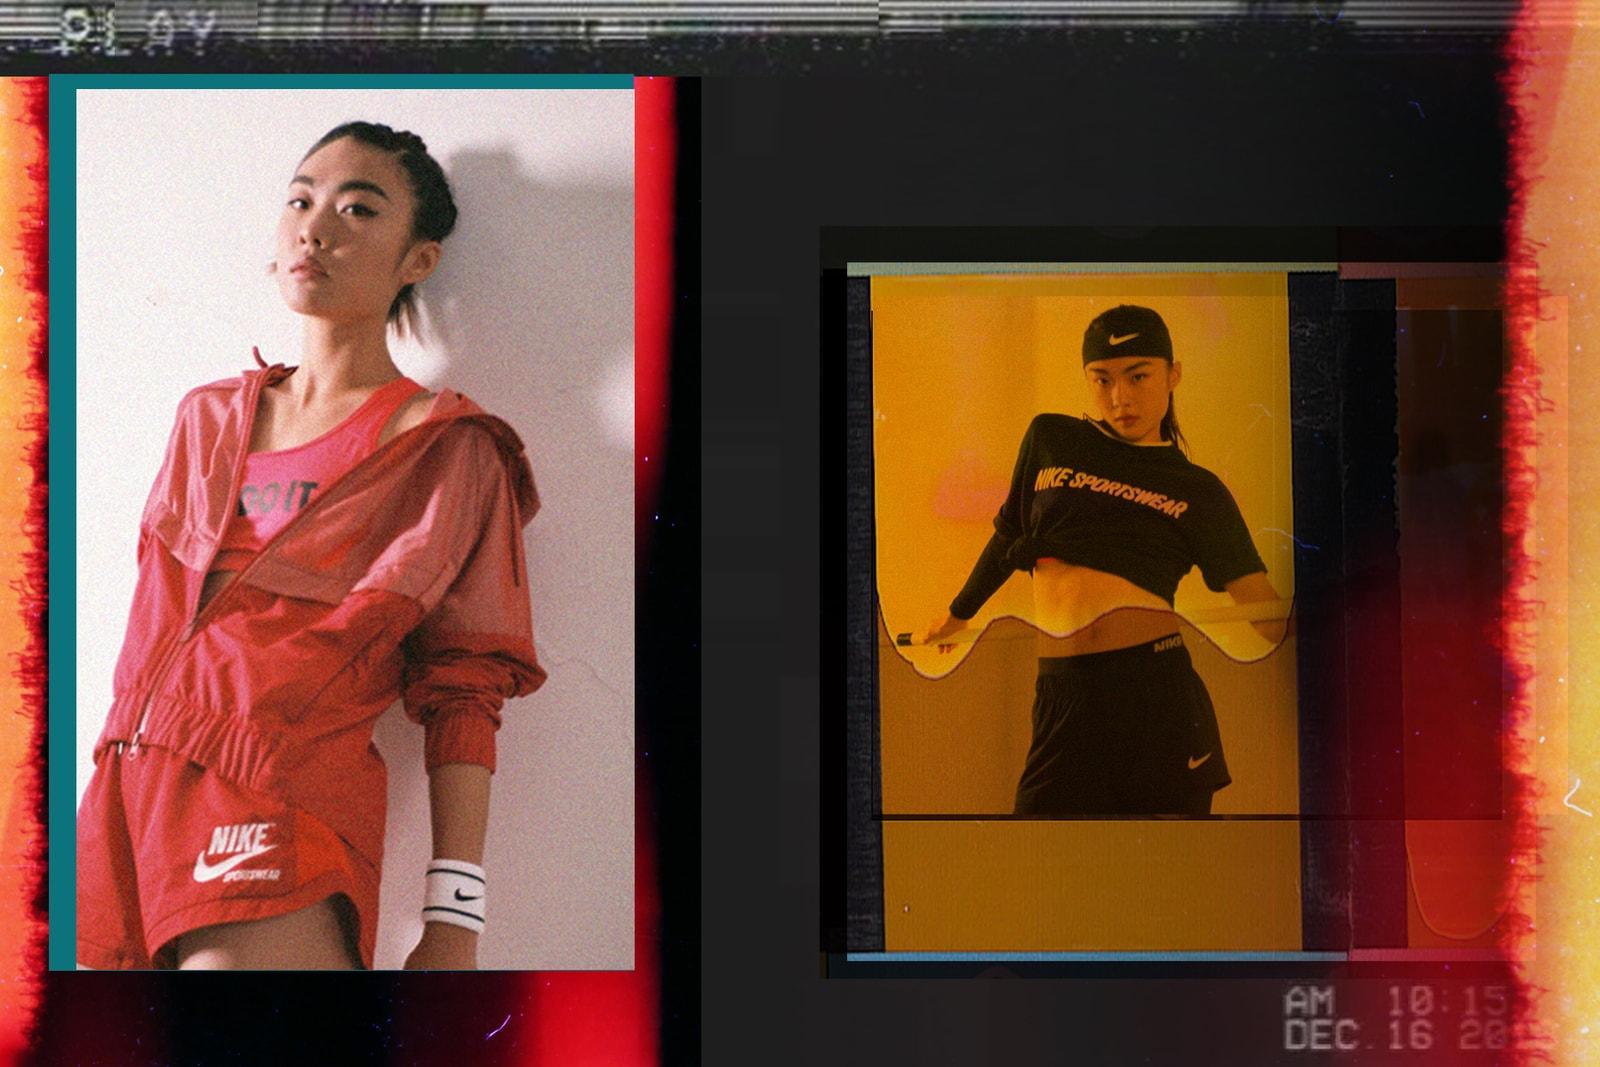 Nike Cecilia Yeung High Jumper Hong Kong Athlete Olympics Hypebae Editorial Interview Model Air Max 97 Ultra Swoosh